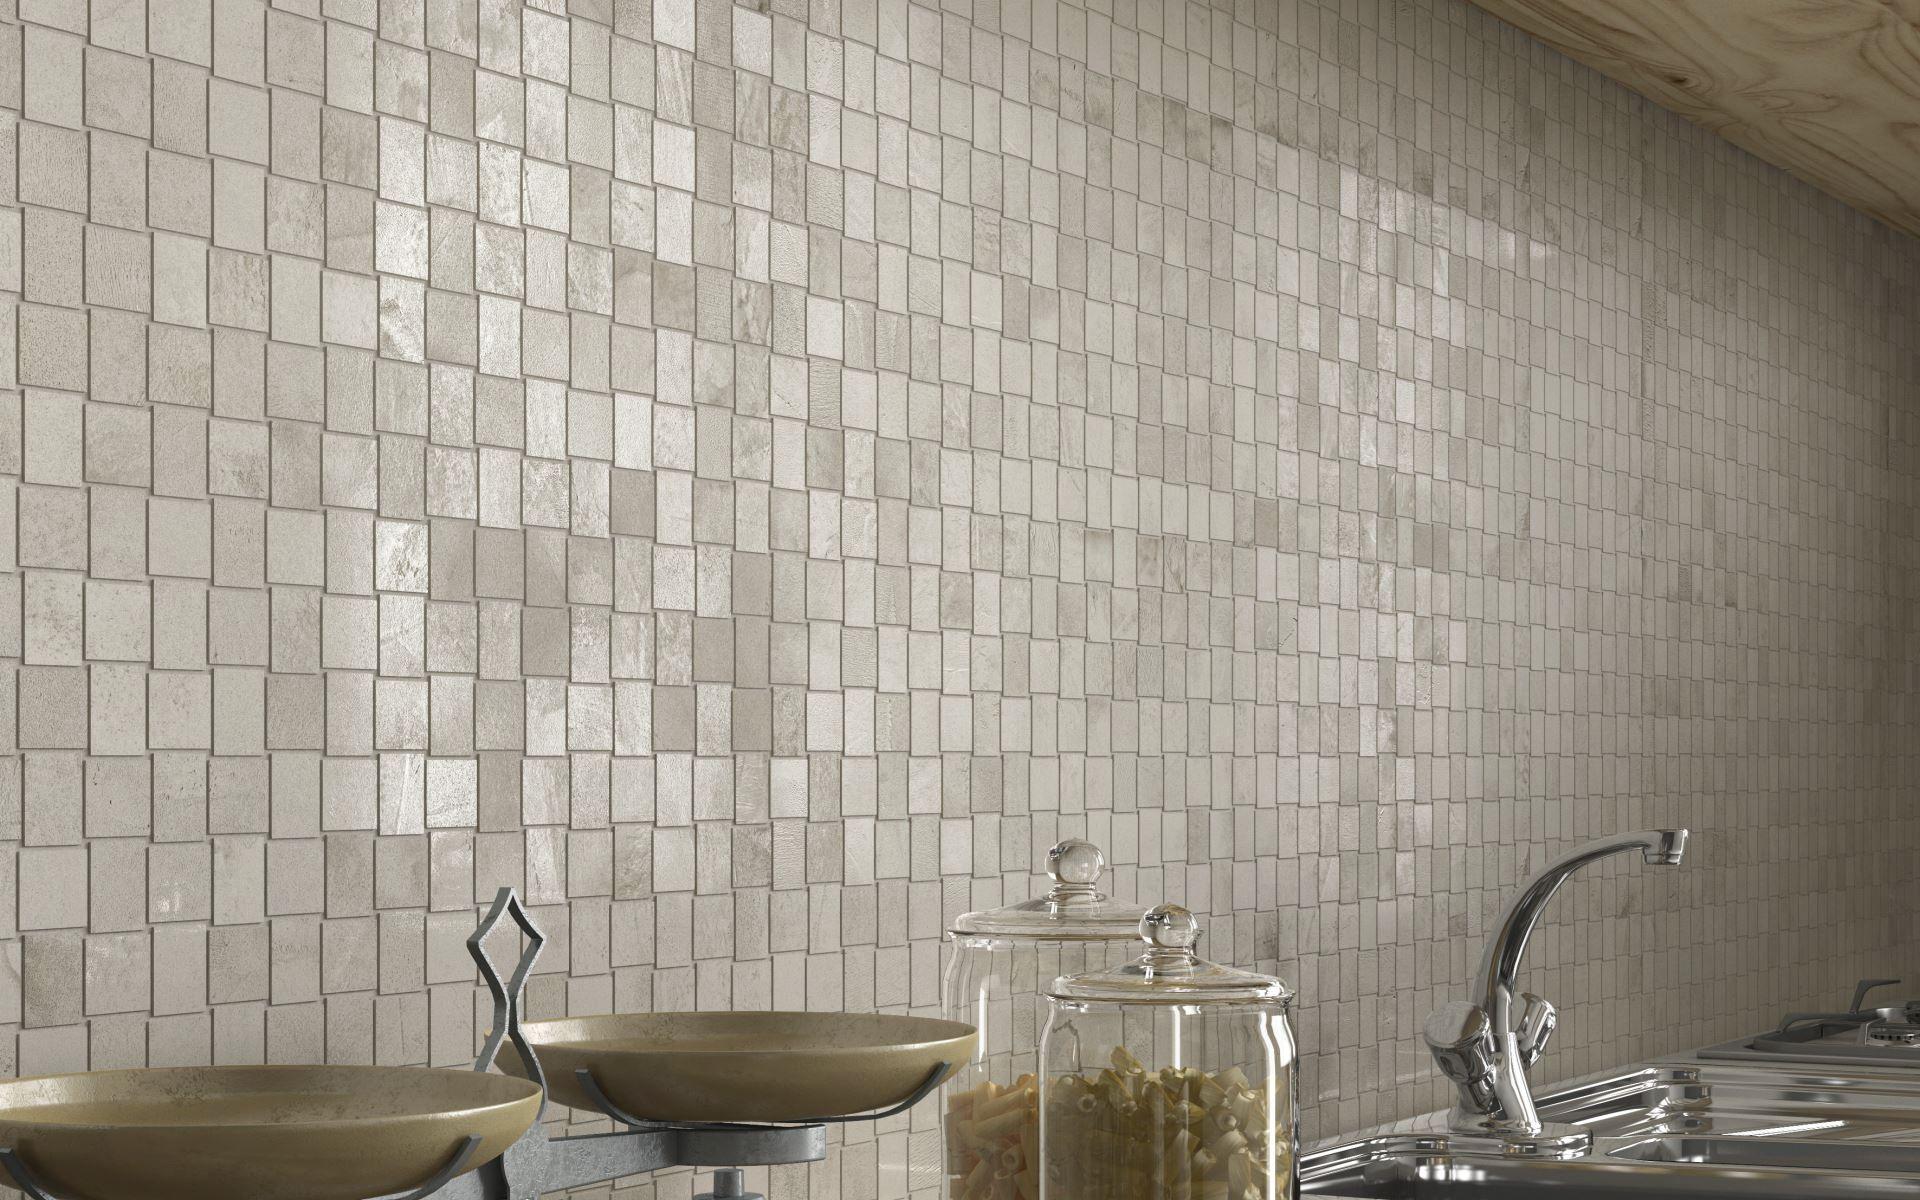 Emejing Mosaico Cucina Piastrelle Gallery - Ideas & Design 2017 ...